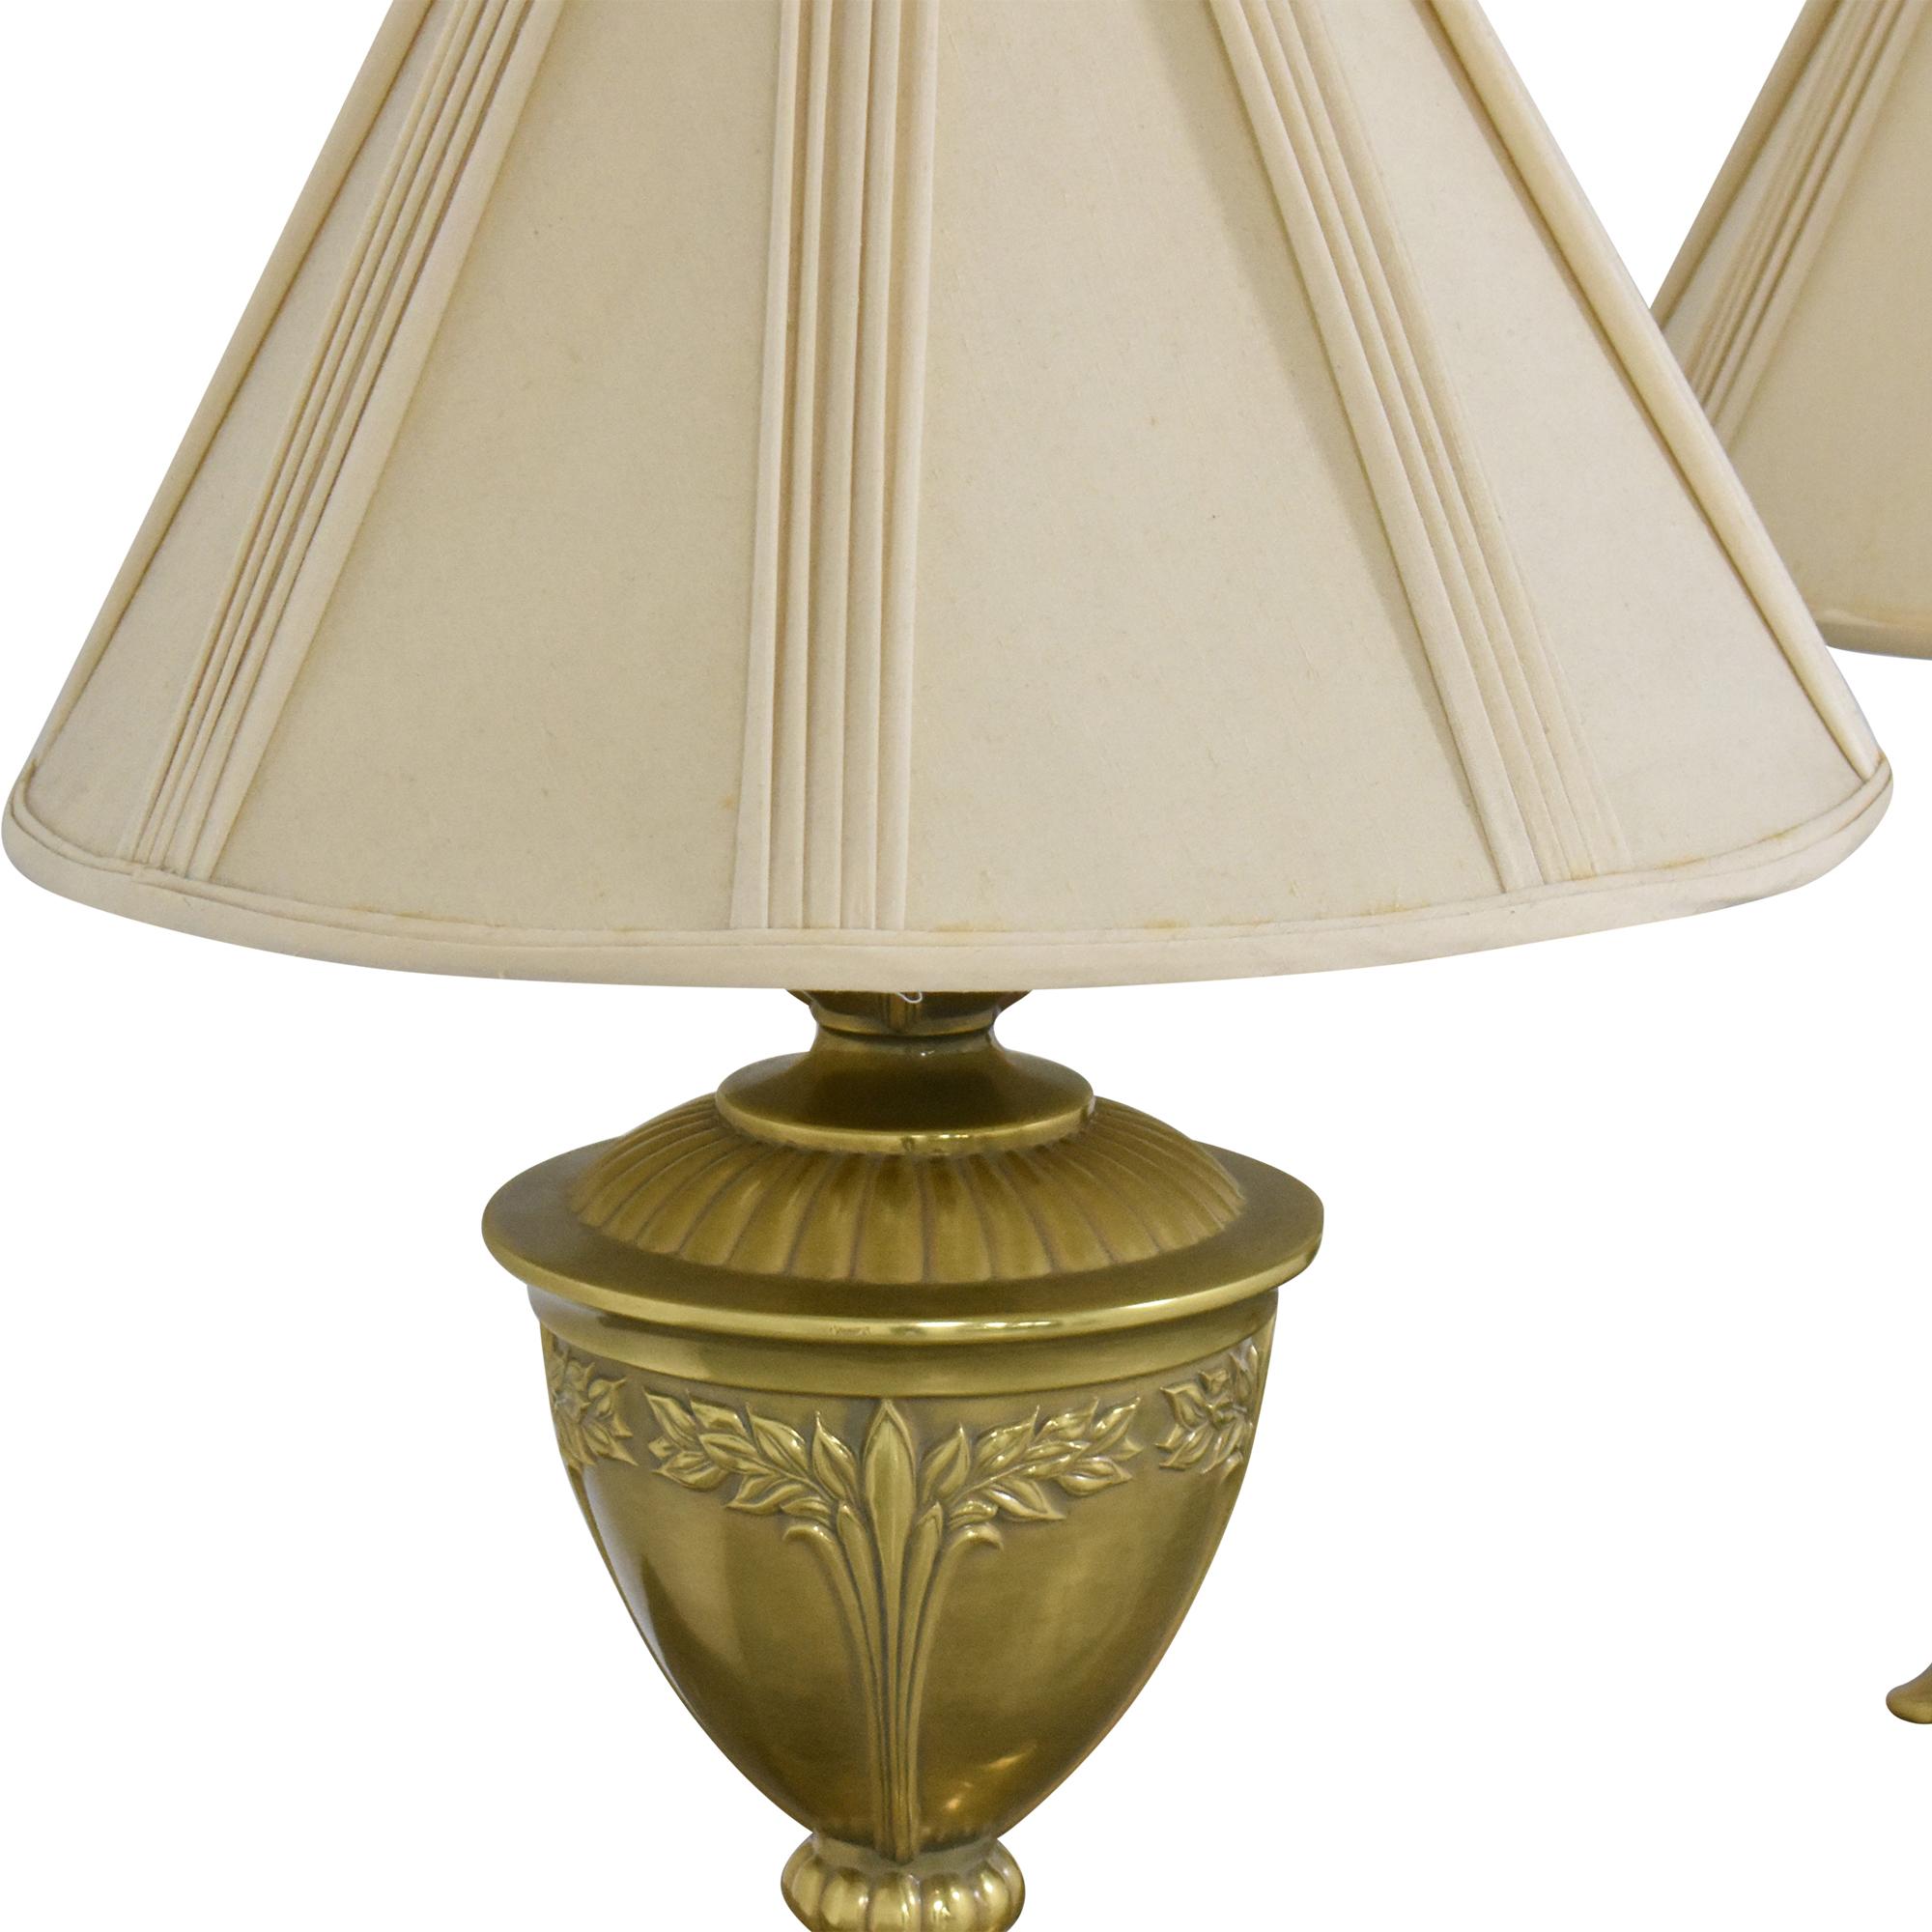 Ethan Allen Ethan Allen Urn Table Lamps second hand